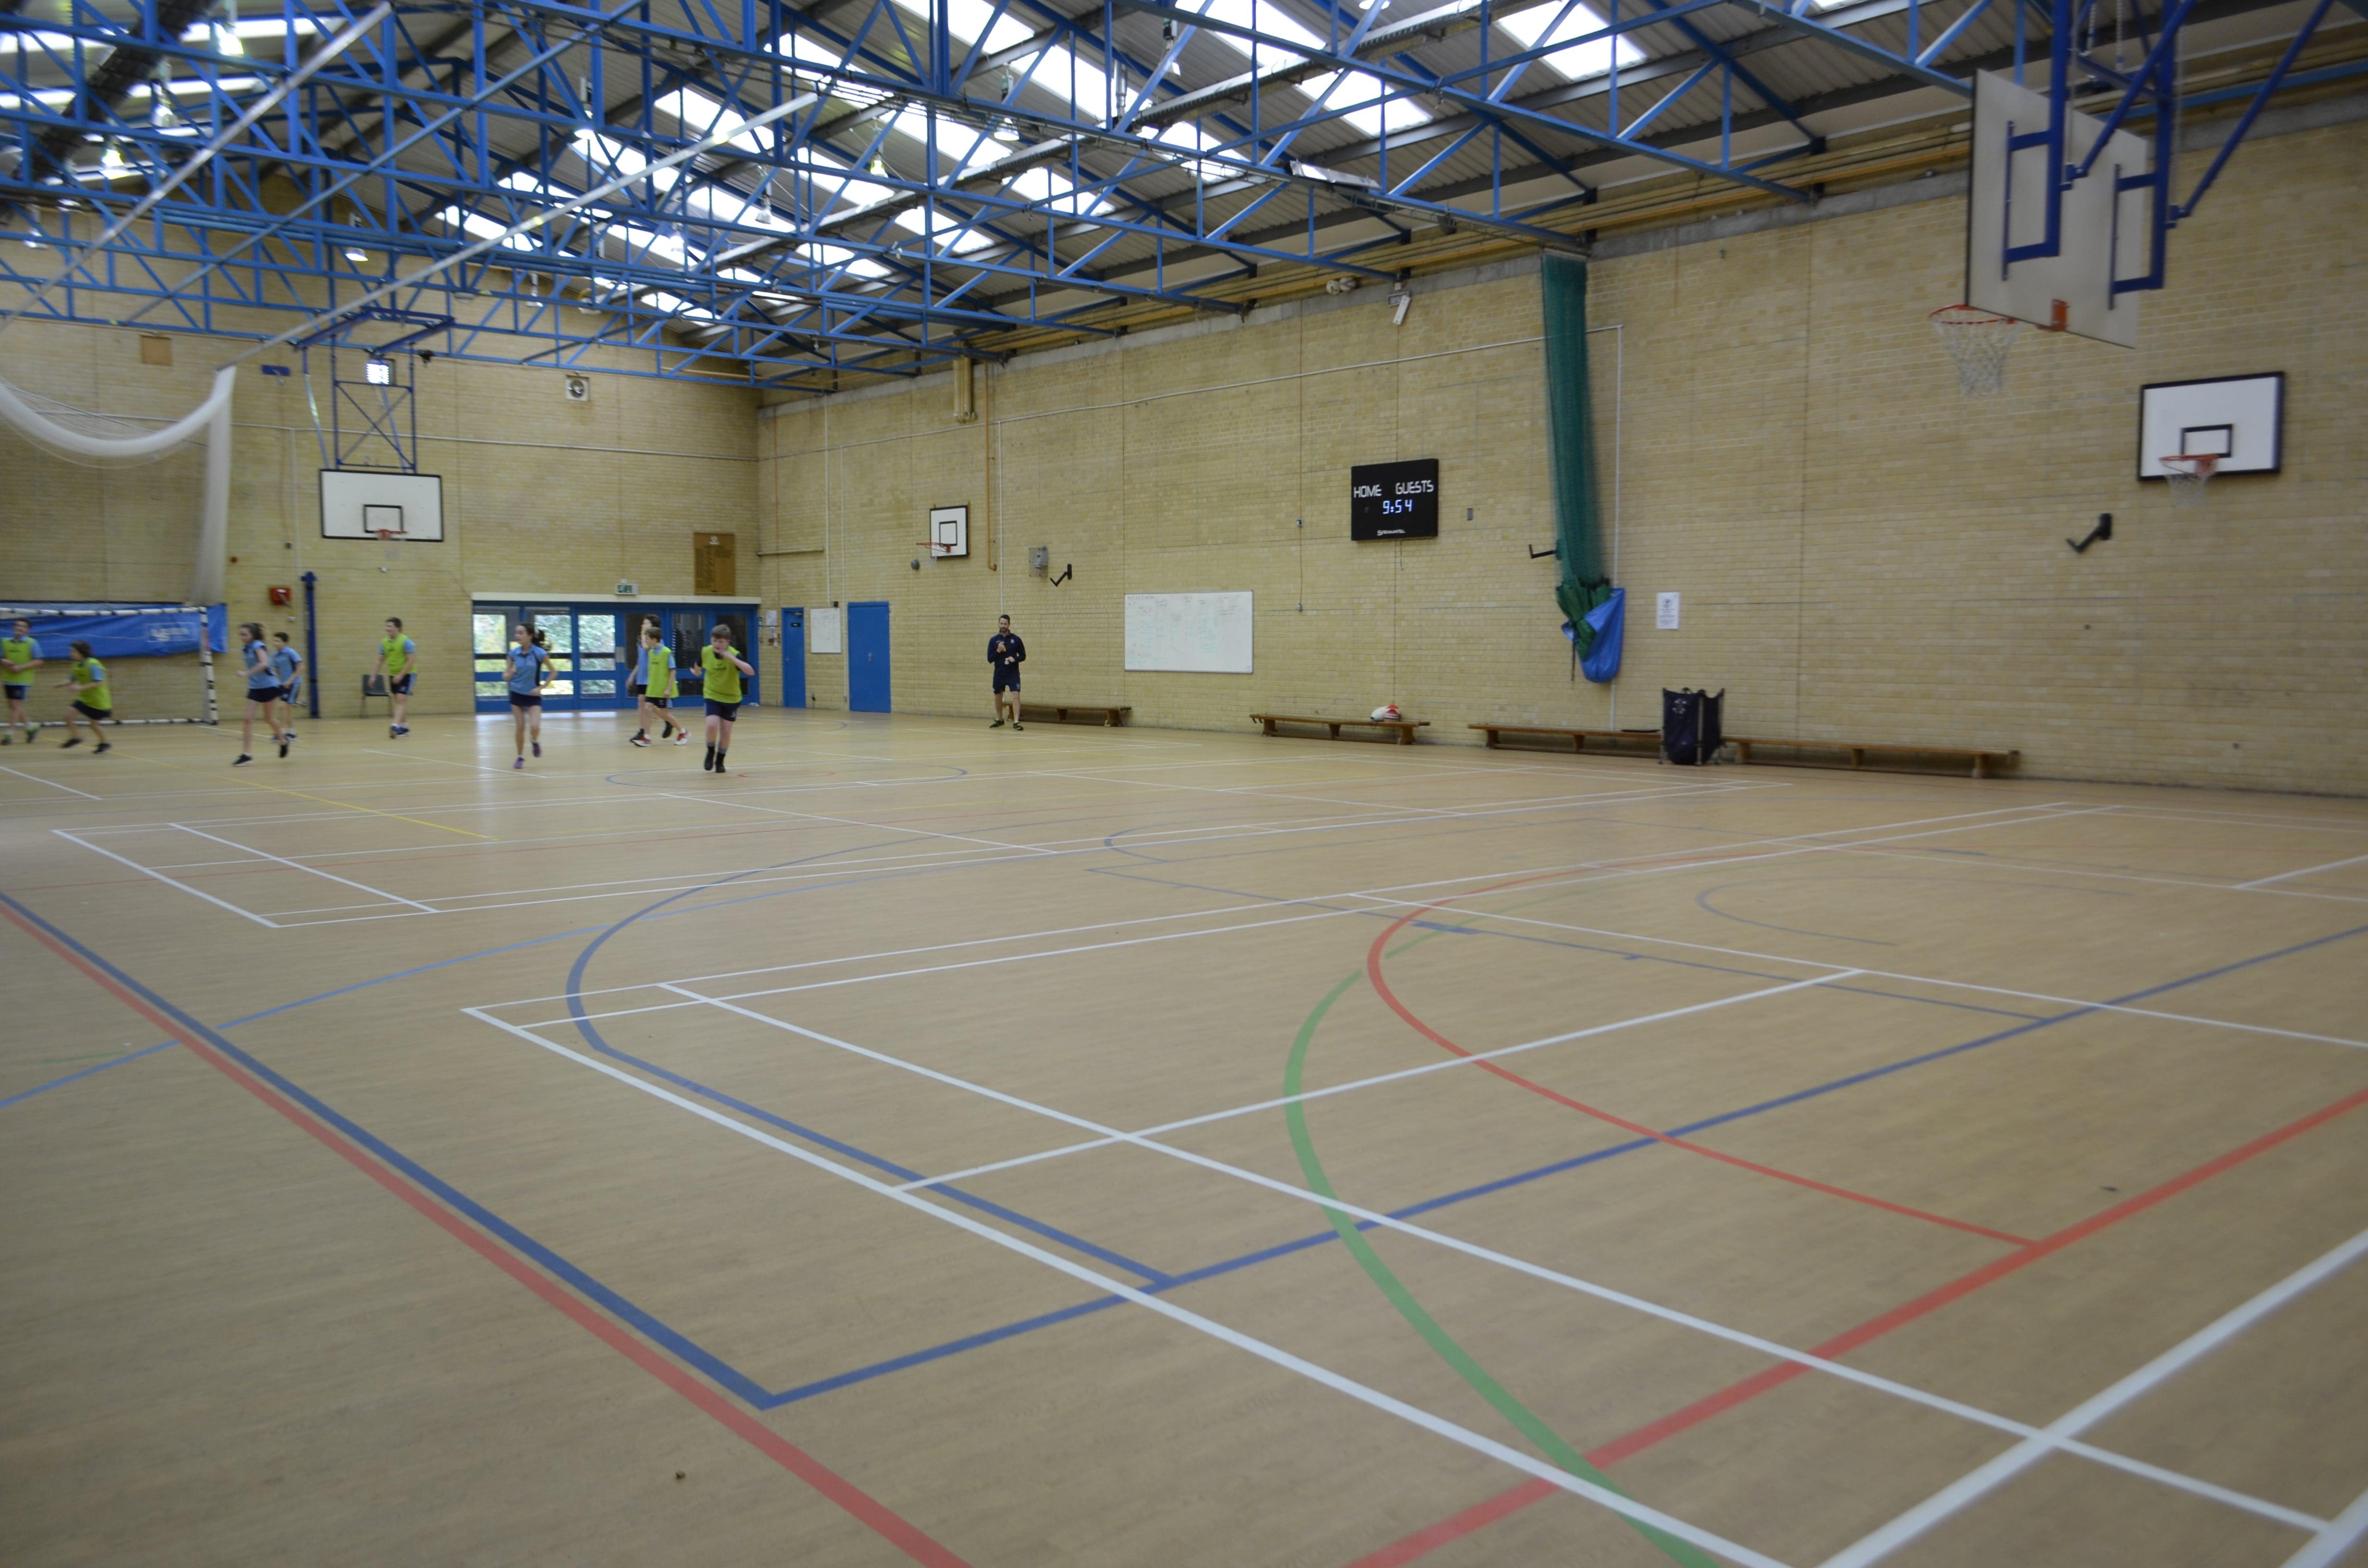 баскетбольная площадка школы